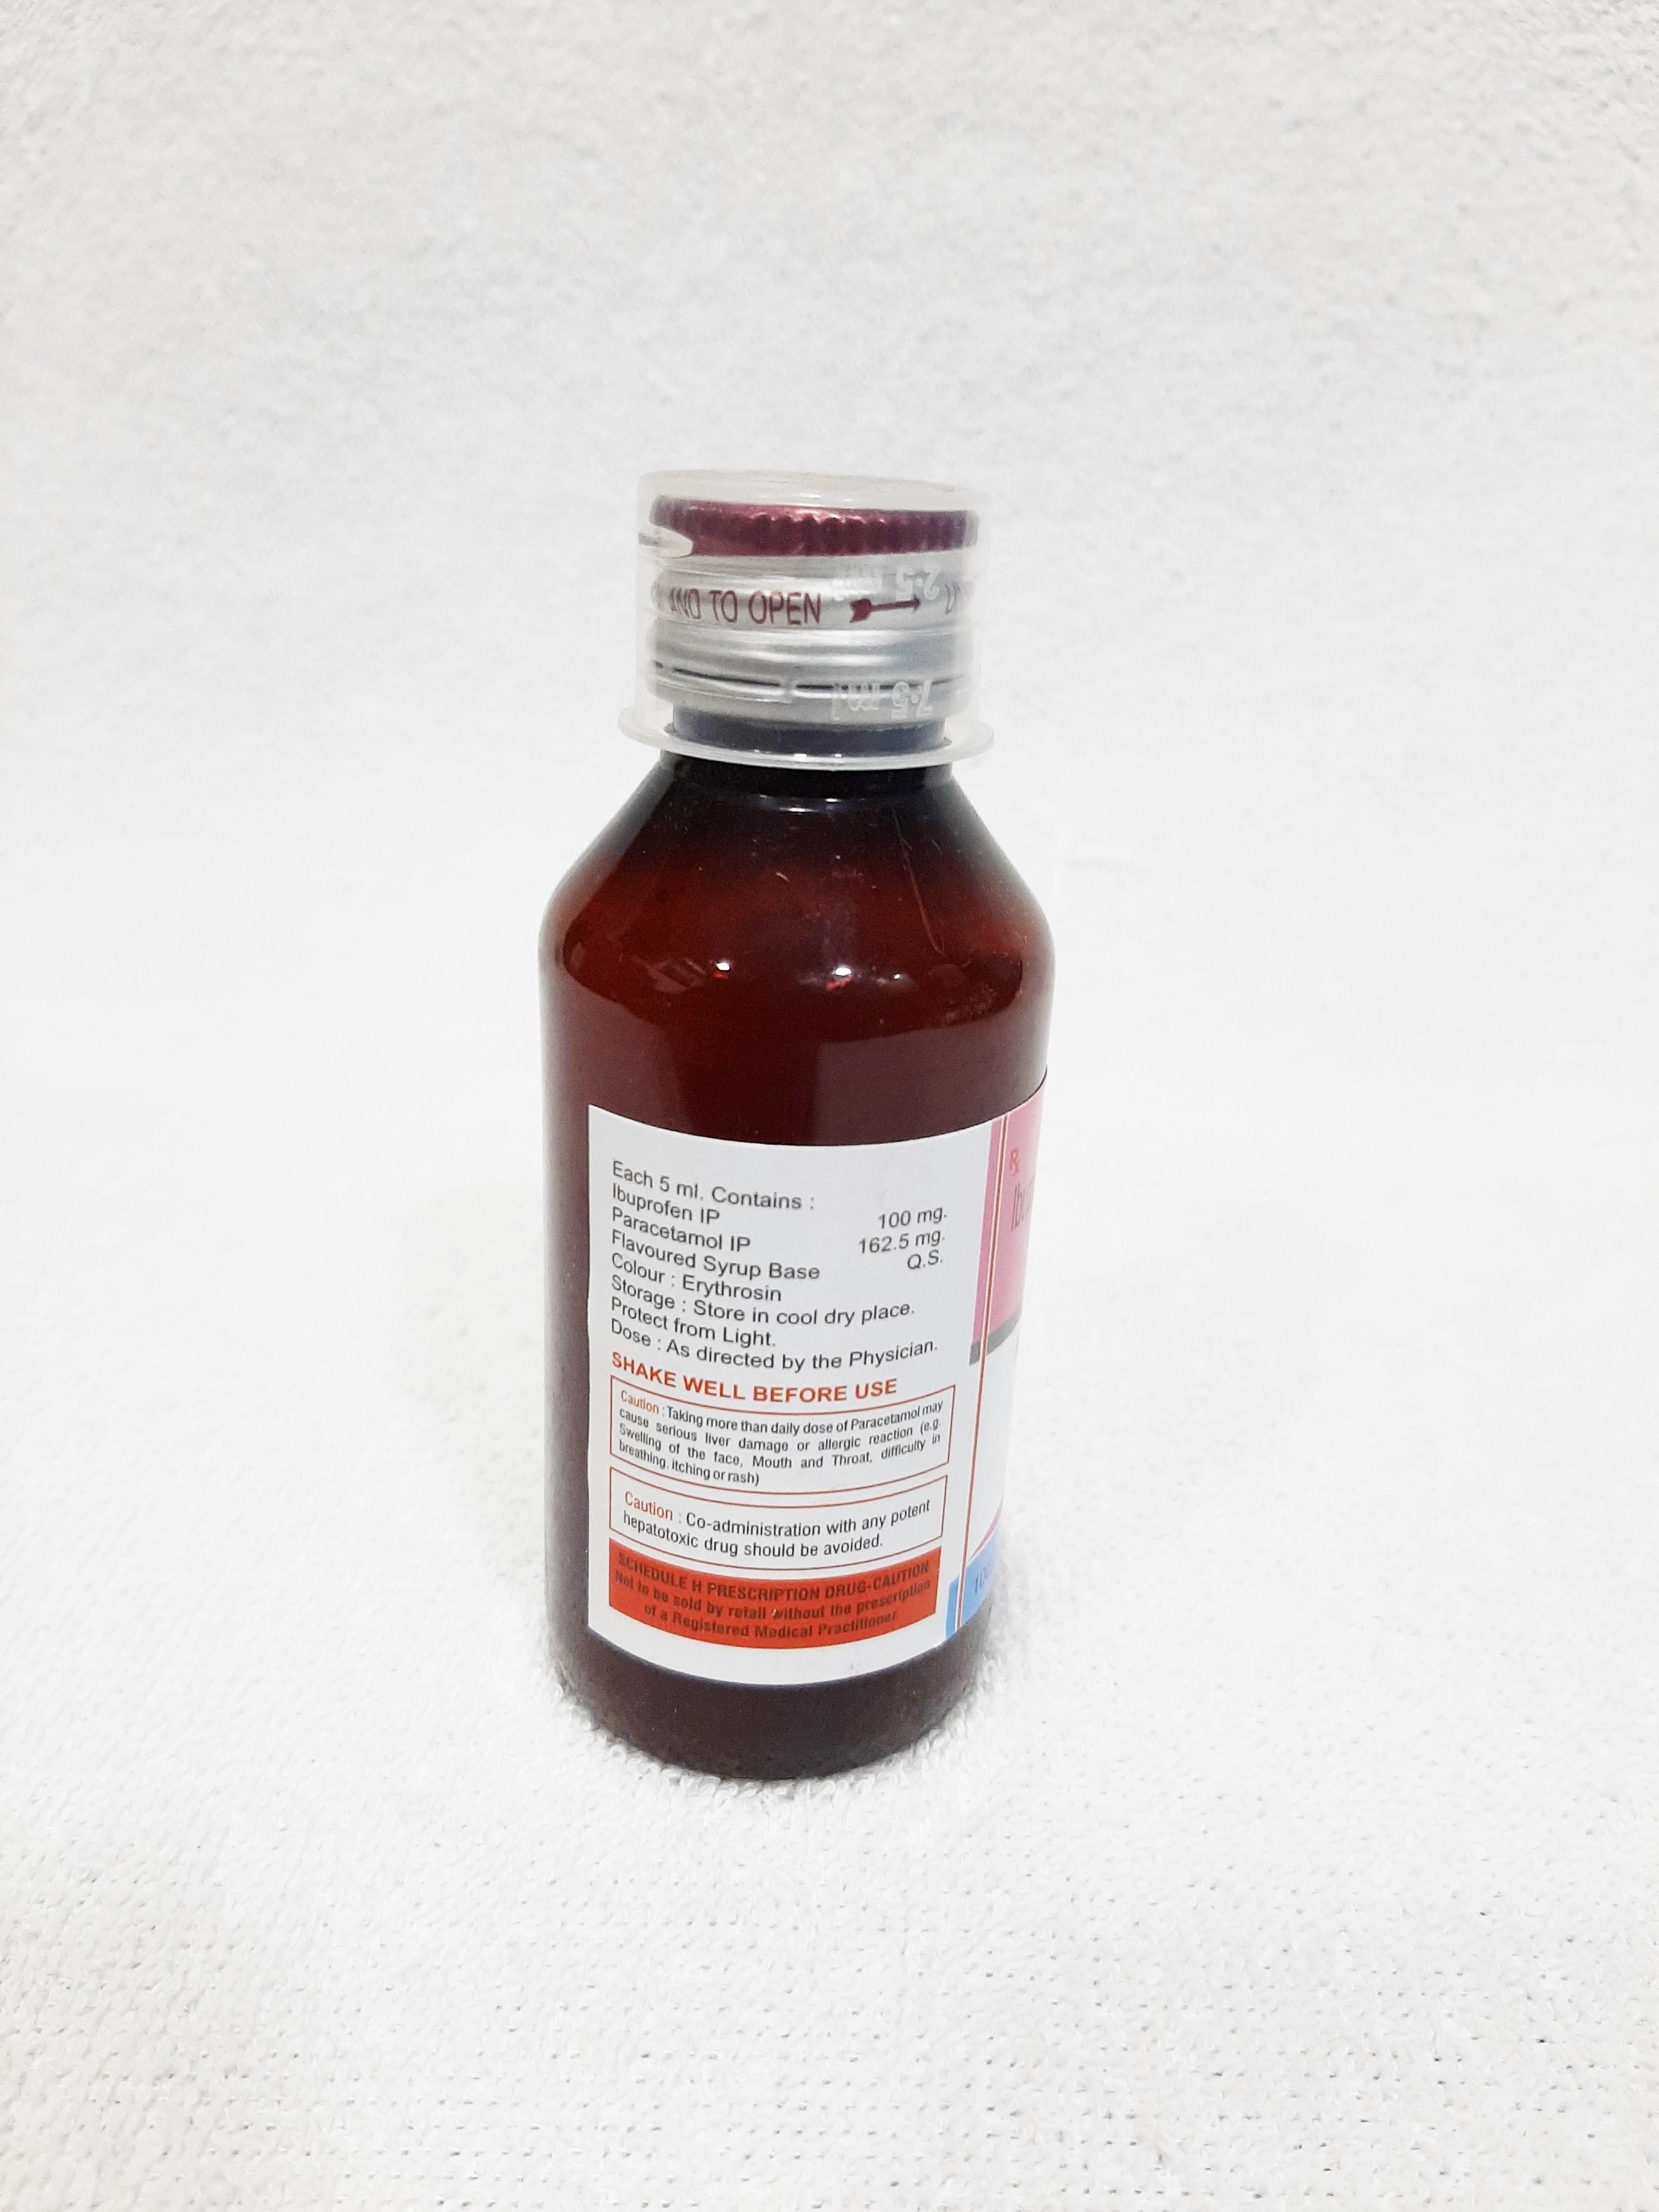 Ibuprofen & Paracetamol Syrup